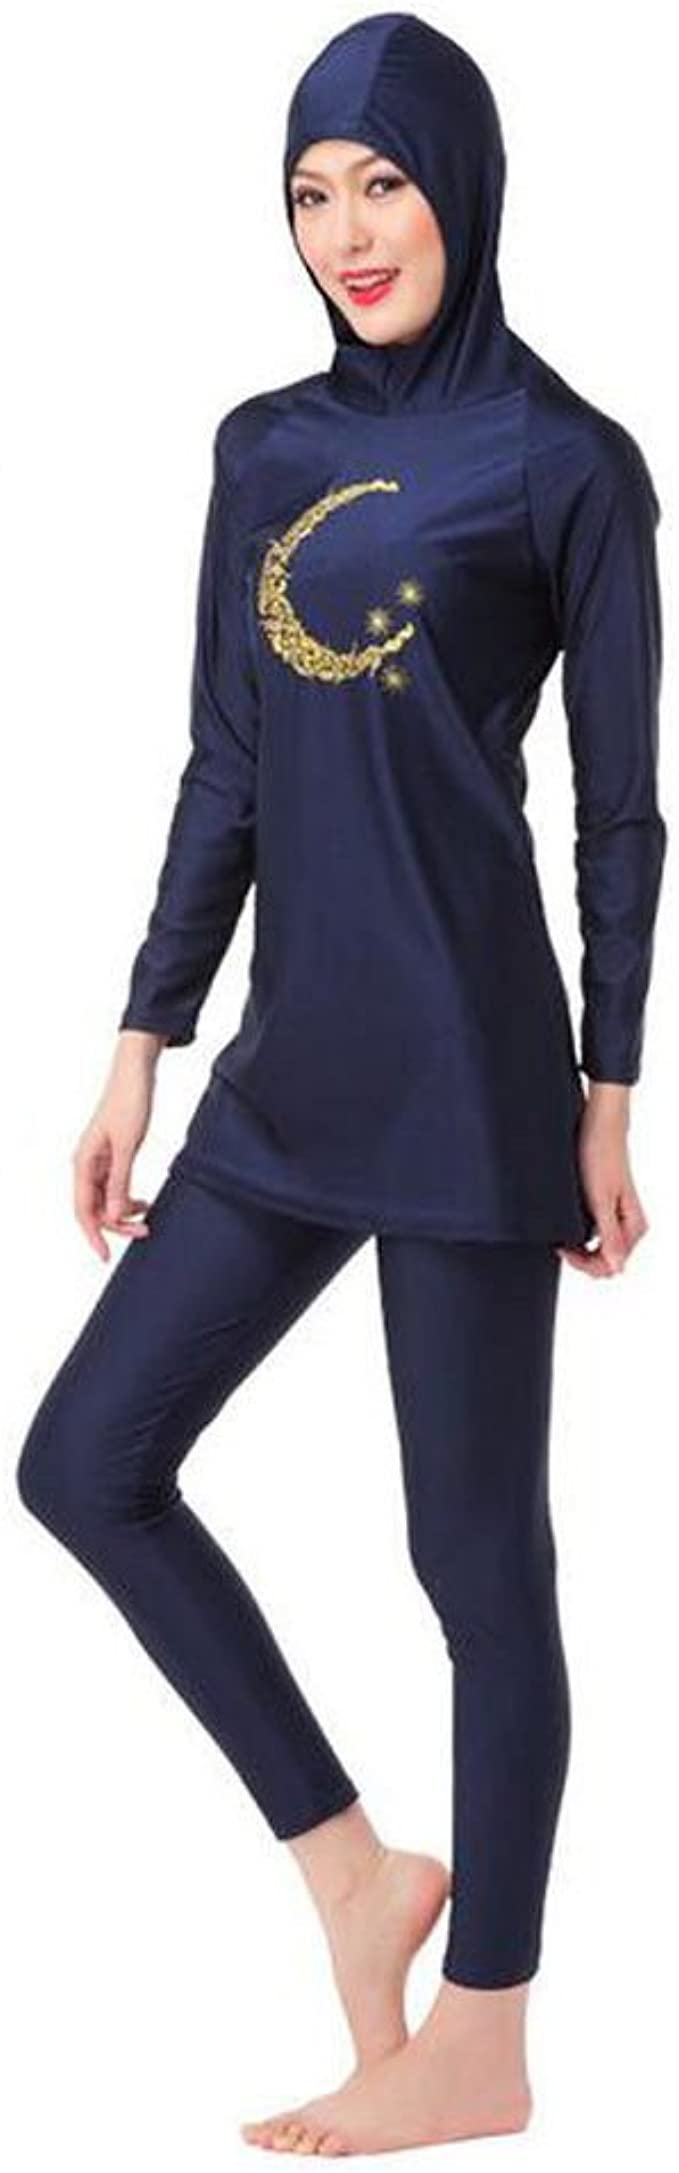 Meijunter Women Lace Perspective Lace up Open Back Bodysuit Jumpsuit Leotard Top